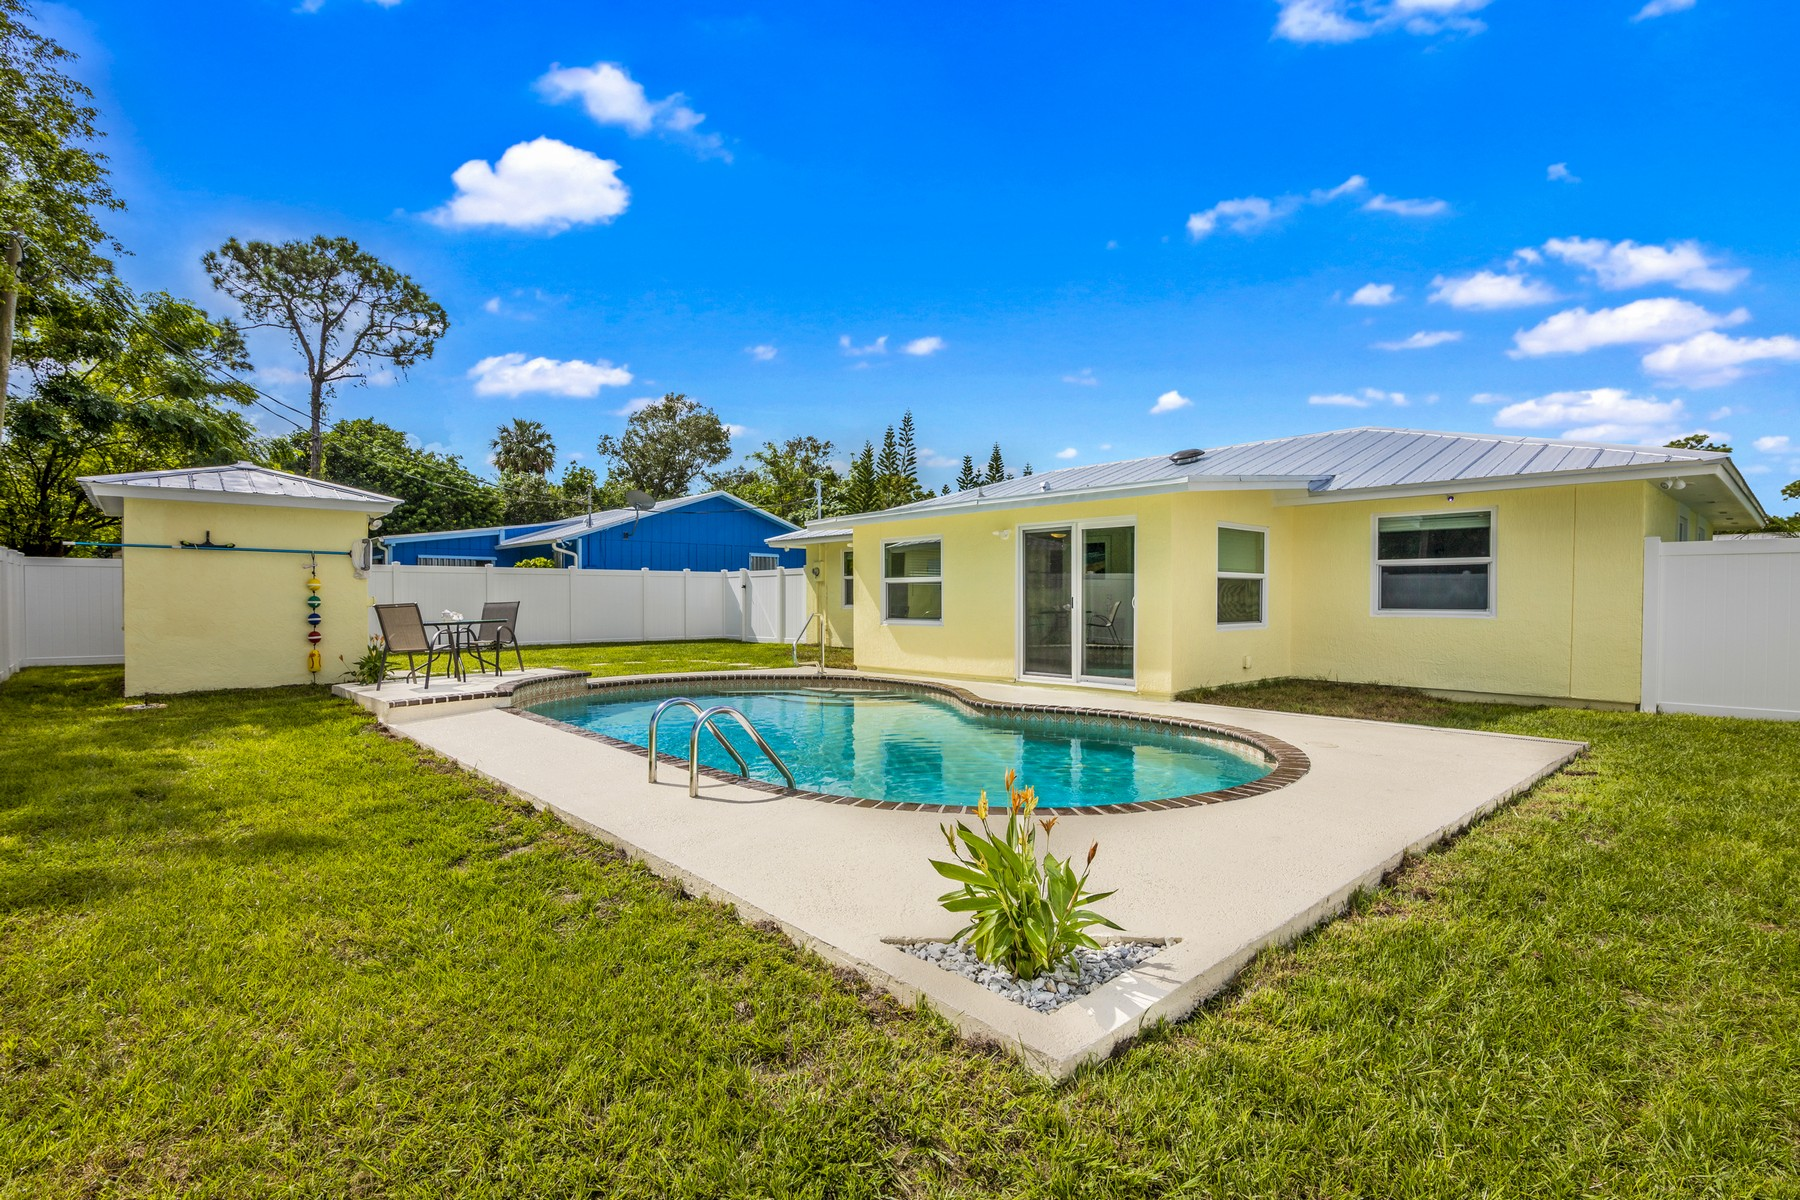 Single Family Homes のために 売買 アット Transformation Extraordinare! 106 11th Court Vero Beach, フロリダ 32960 アメリカ